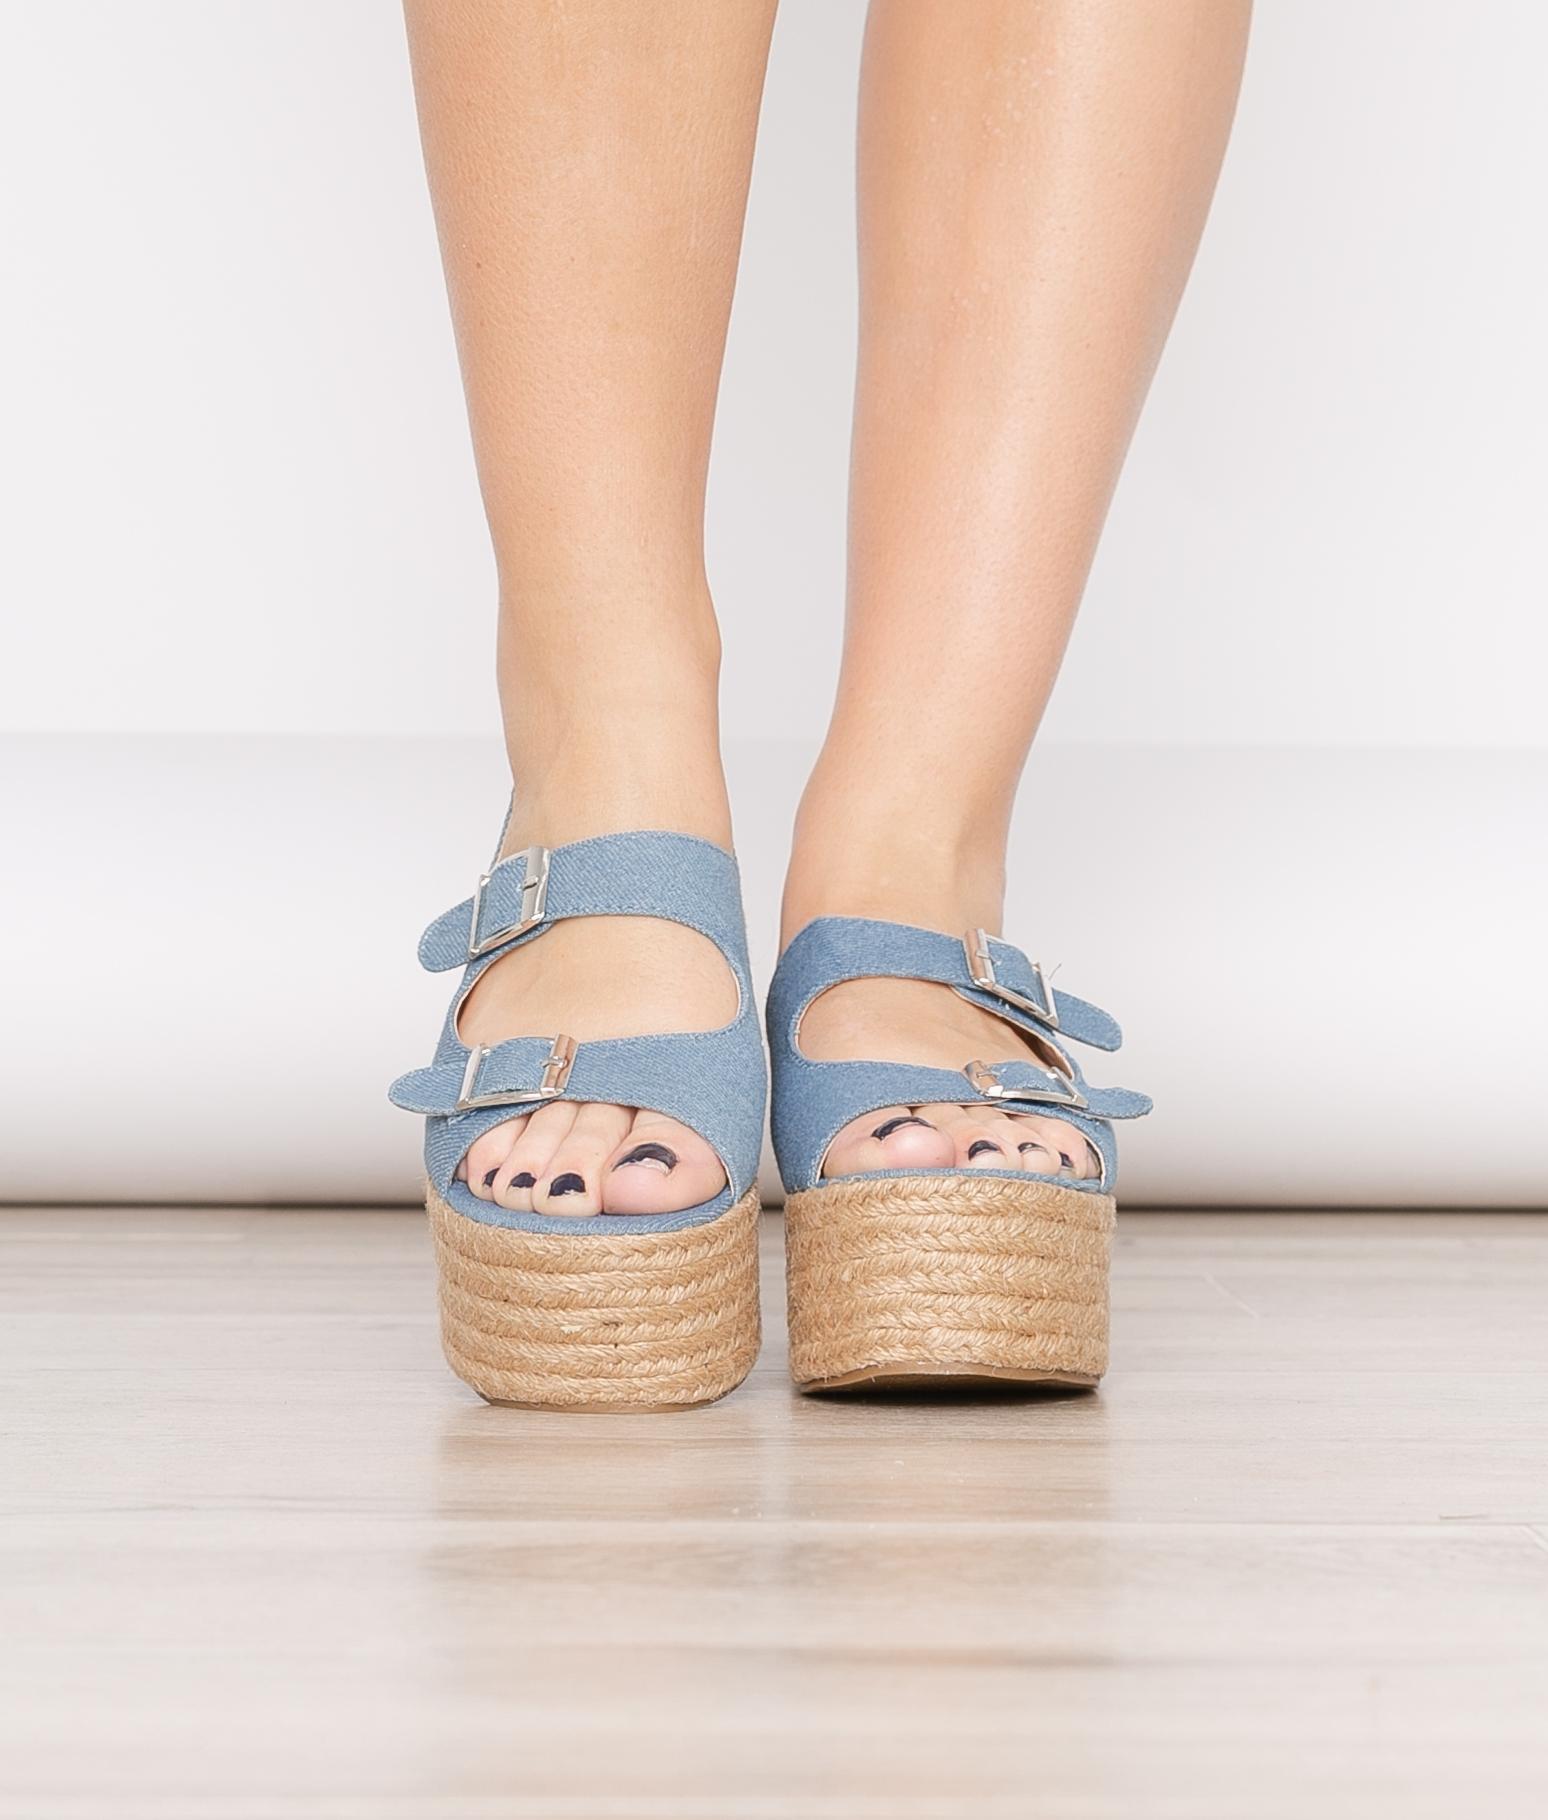 Sandalia Kedir - Azul